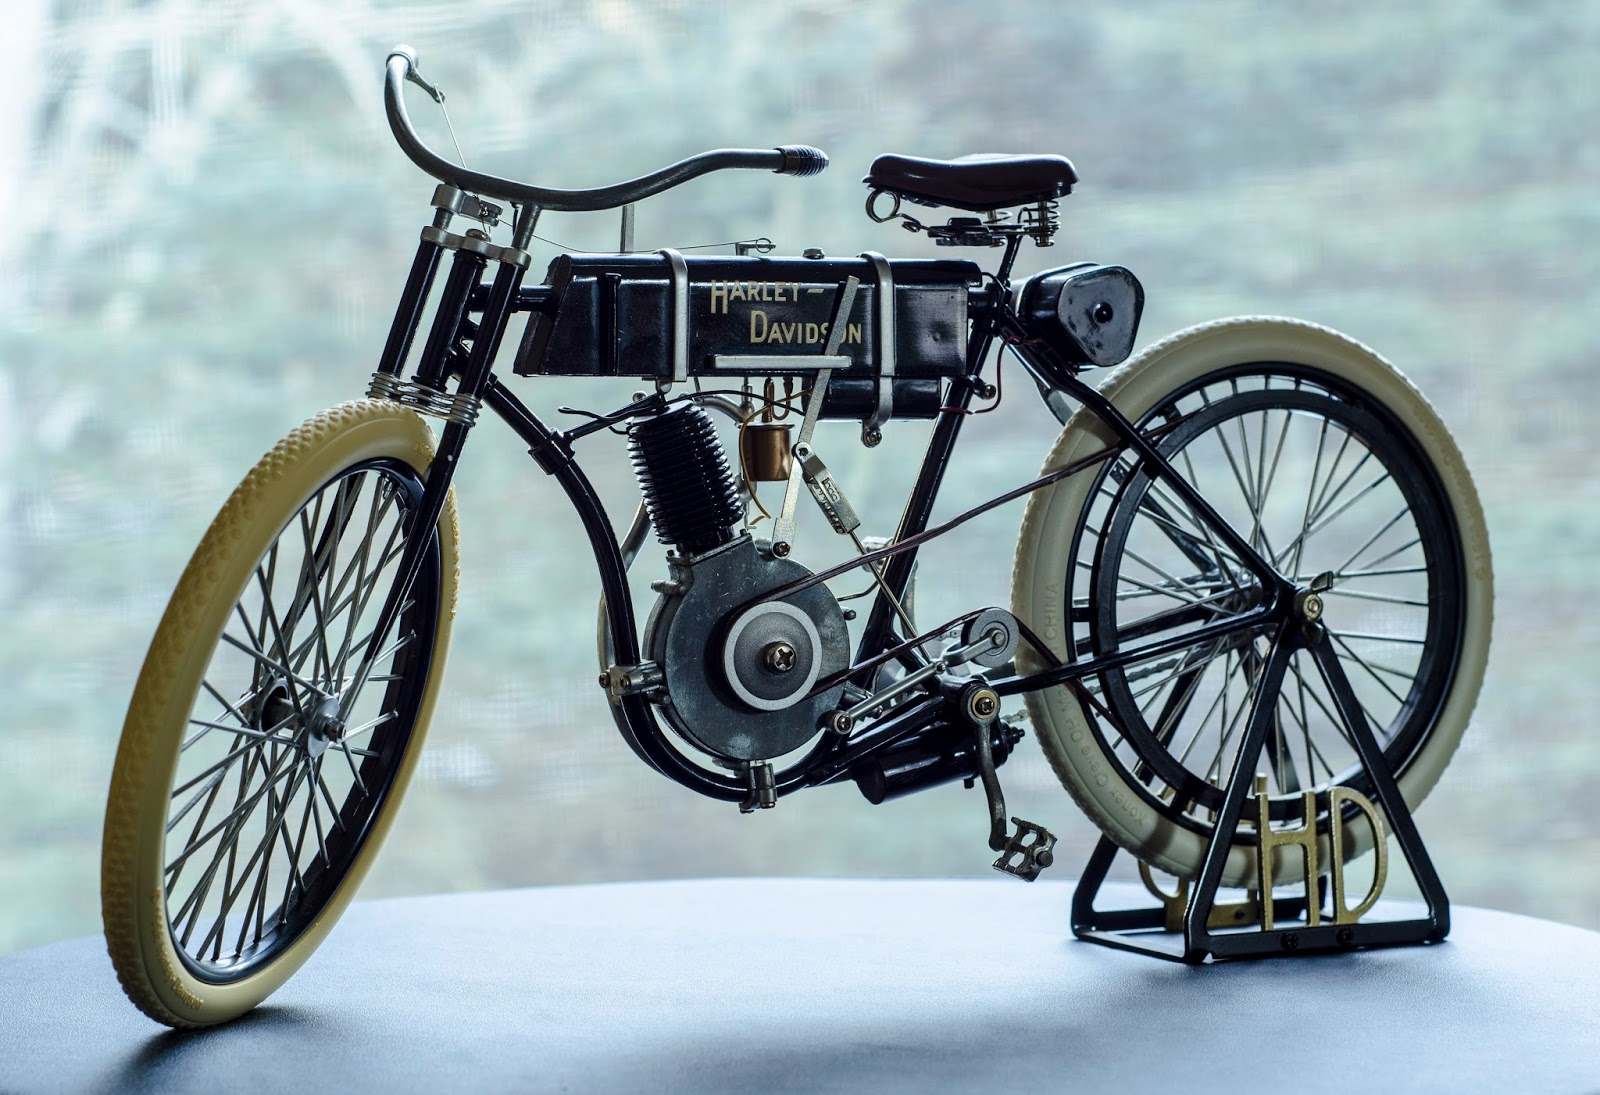 Musings Of A Motorcycle Aficionado February 2014